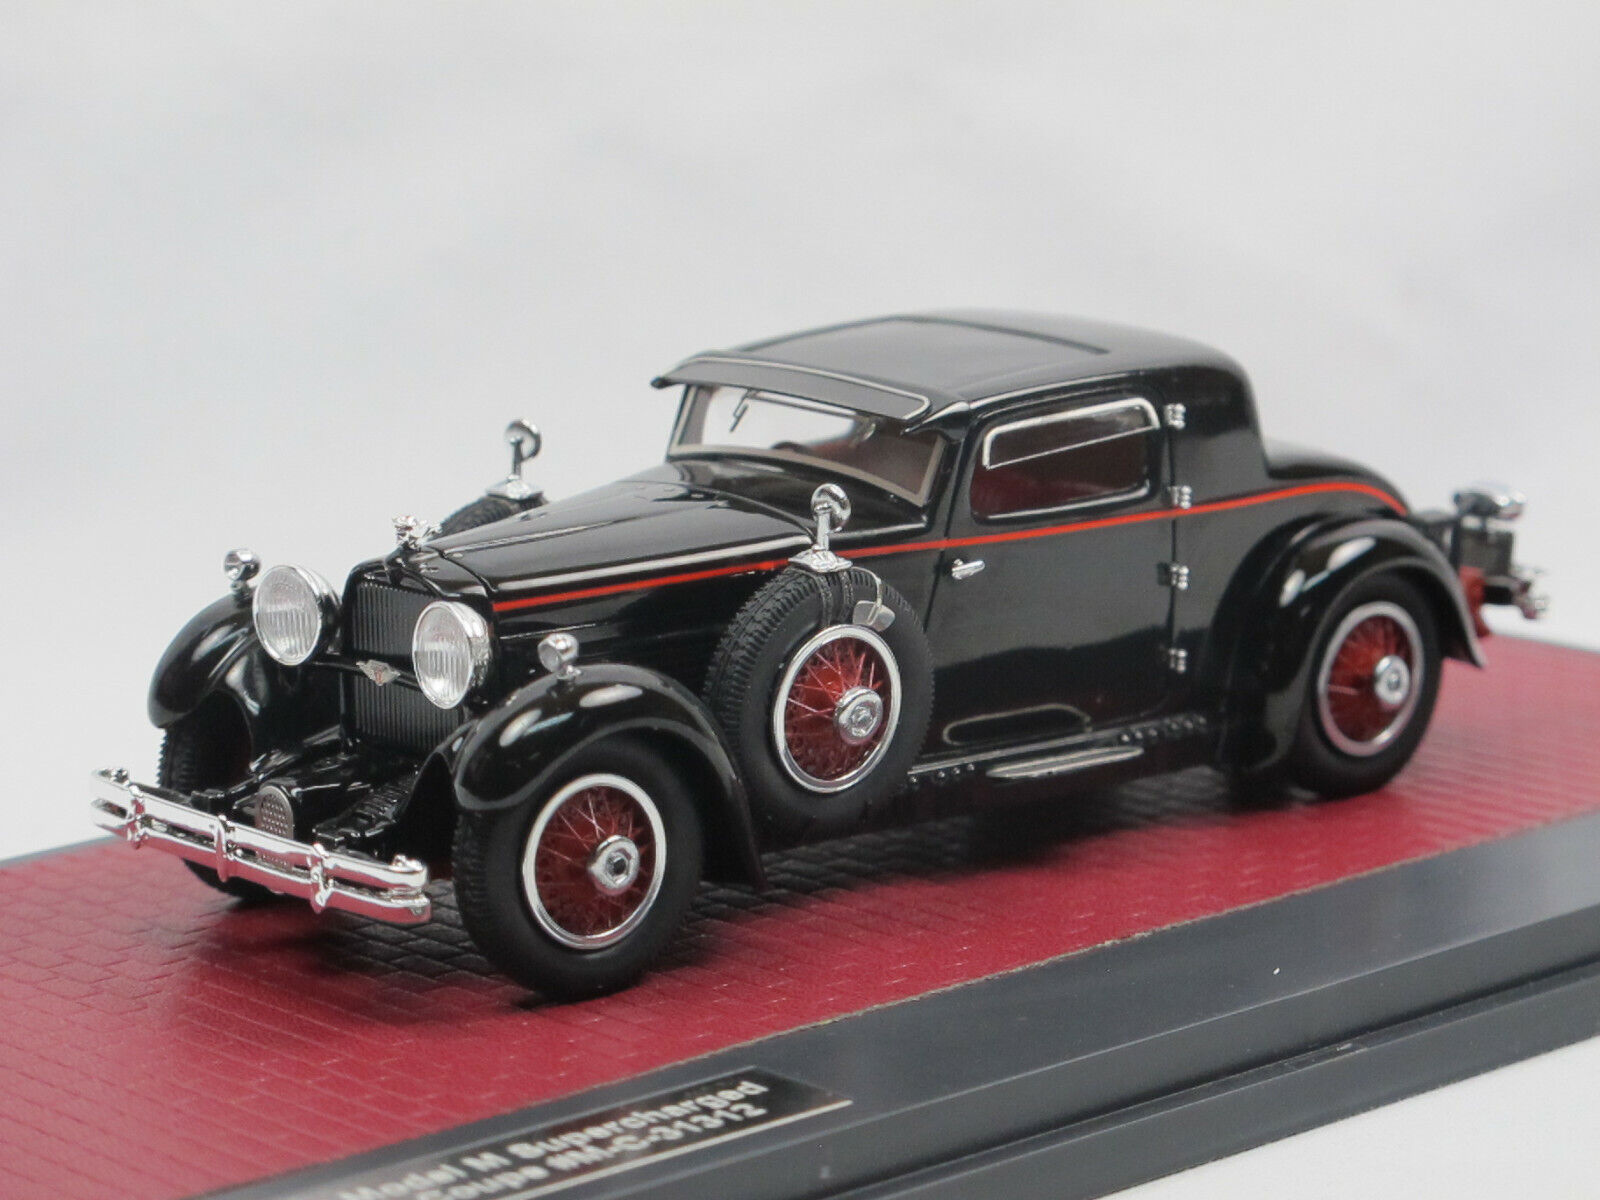 Matrix Scale Models Stutz Model M Supercharged Lancefield Coupe geschlossen 1 43